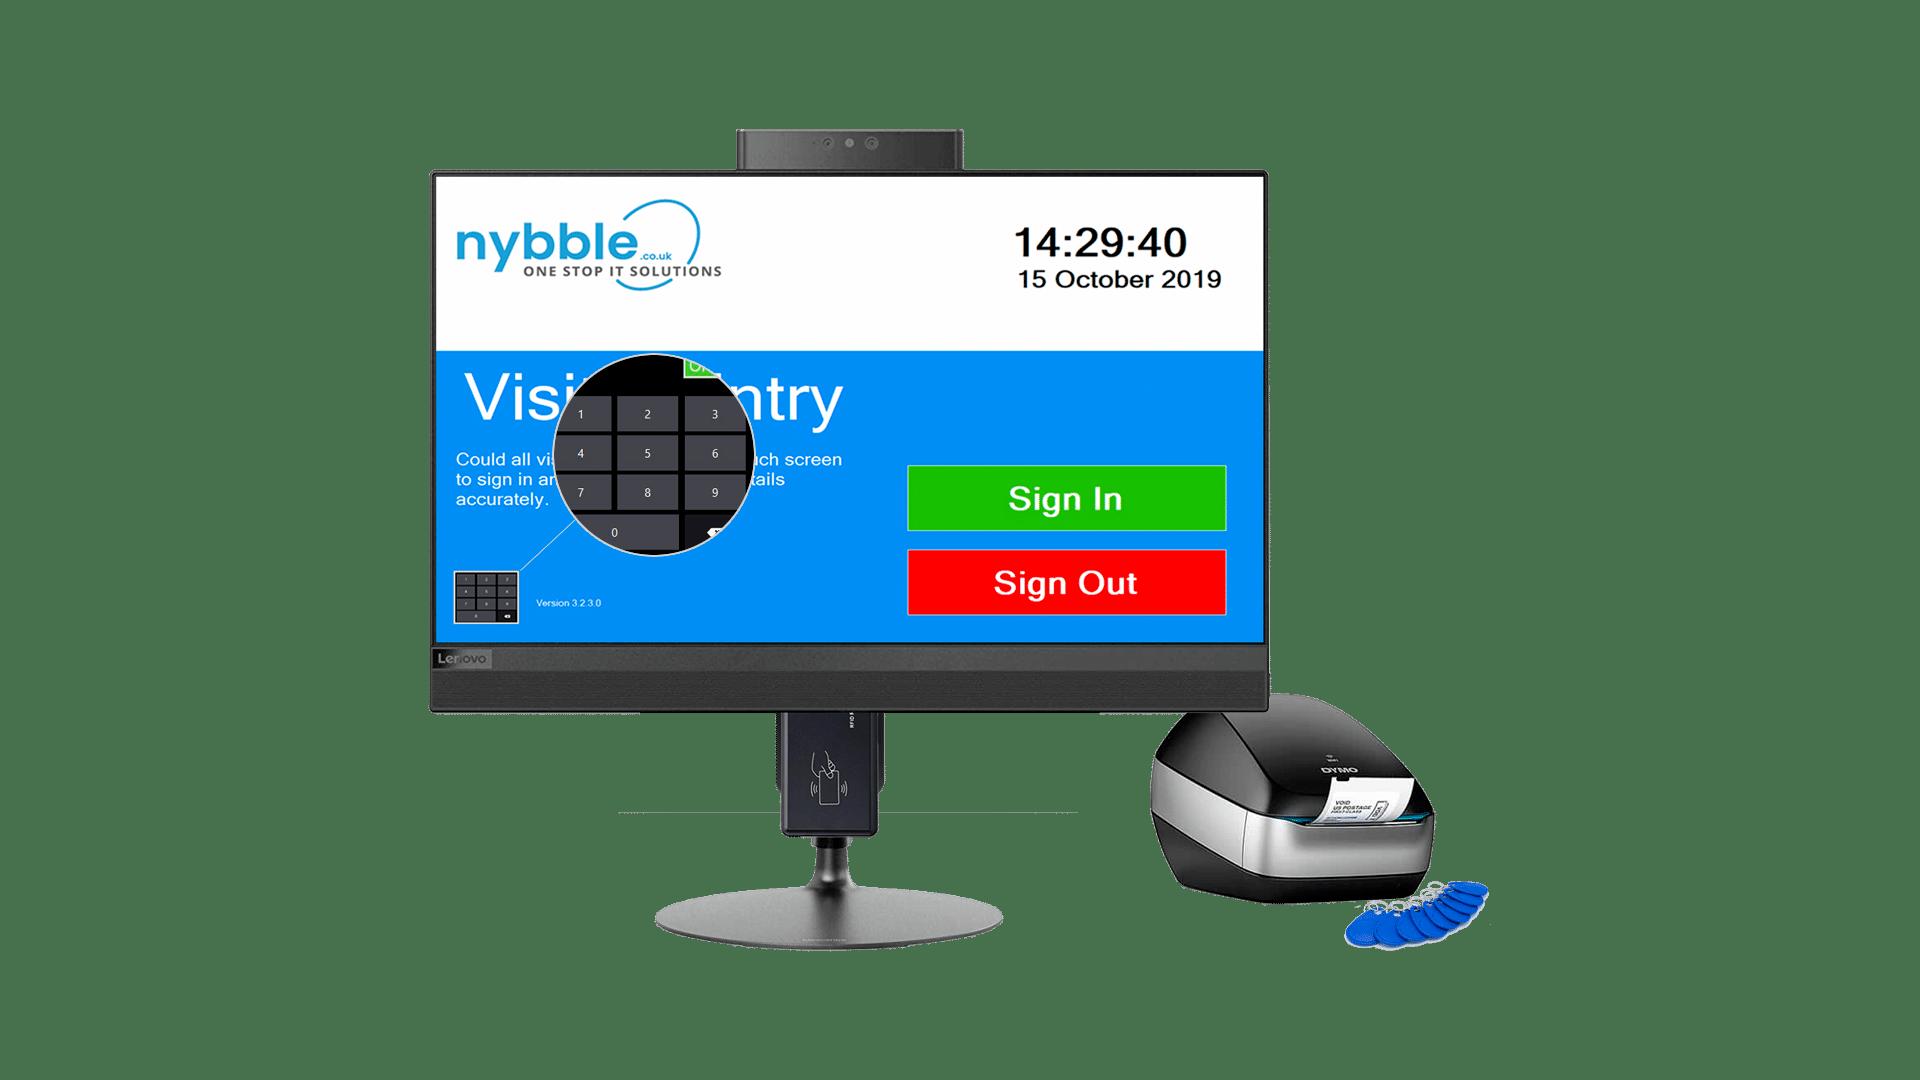 Nybble - Bespoke Visitor Entry Management System